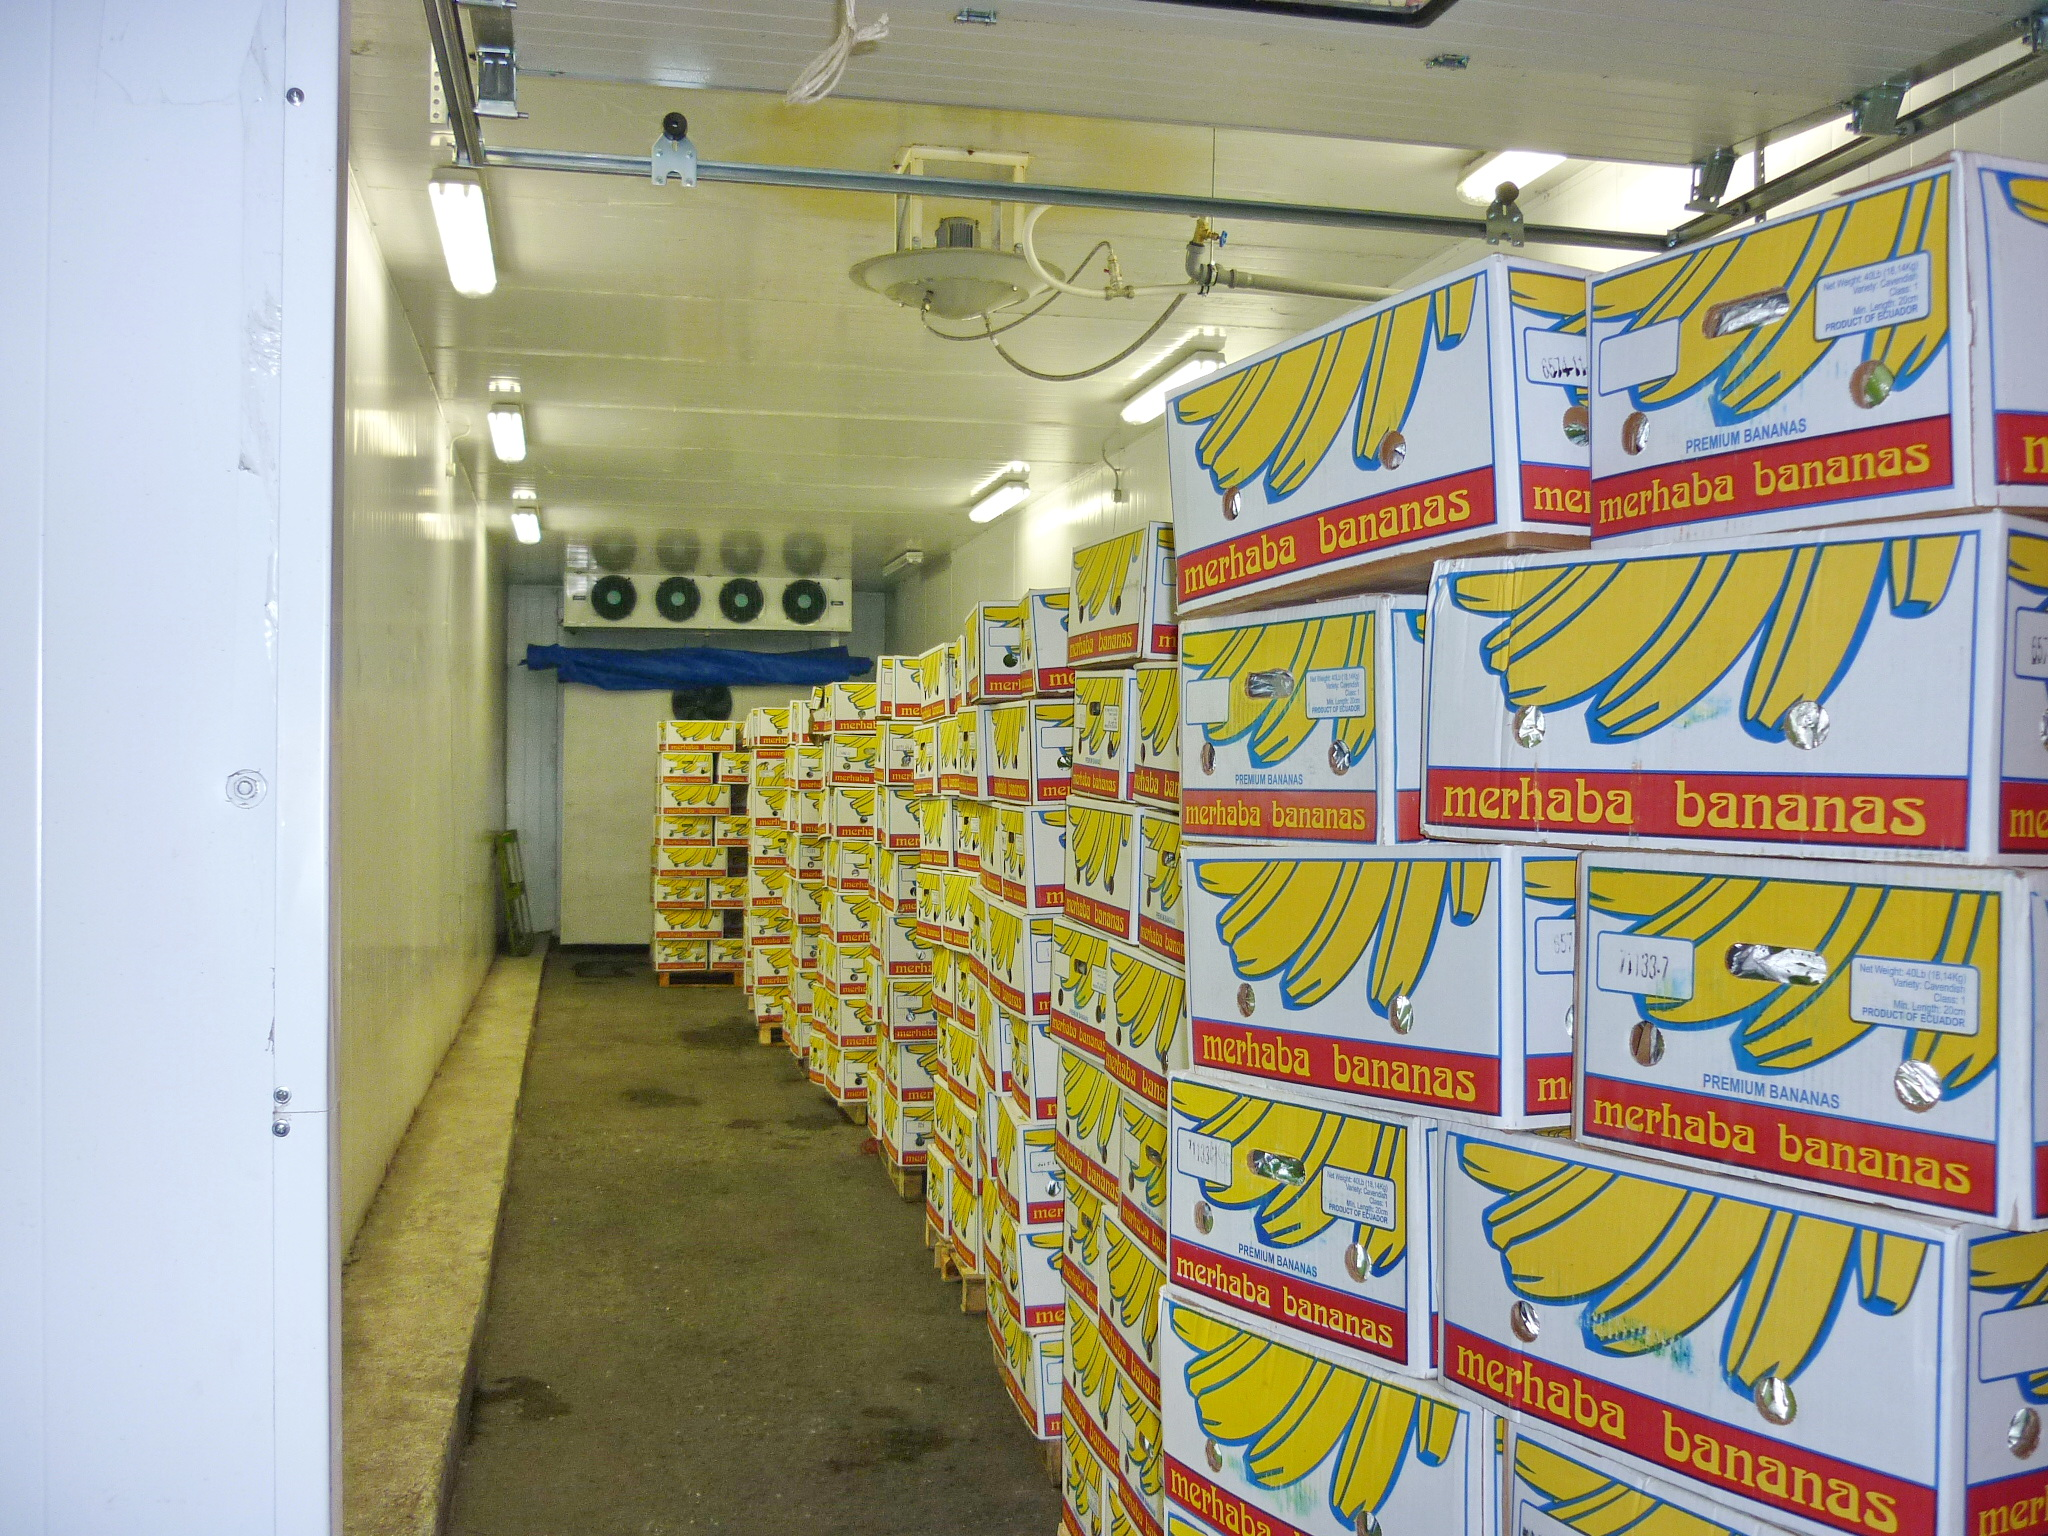 камера газации бананов